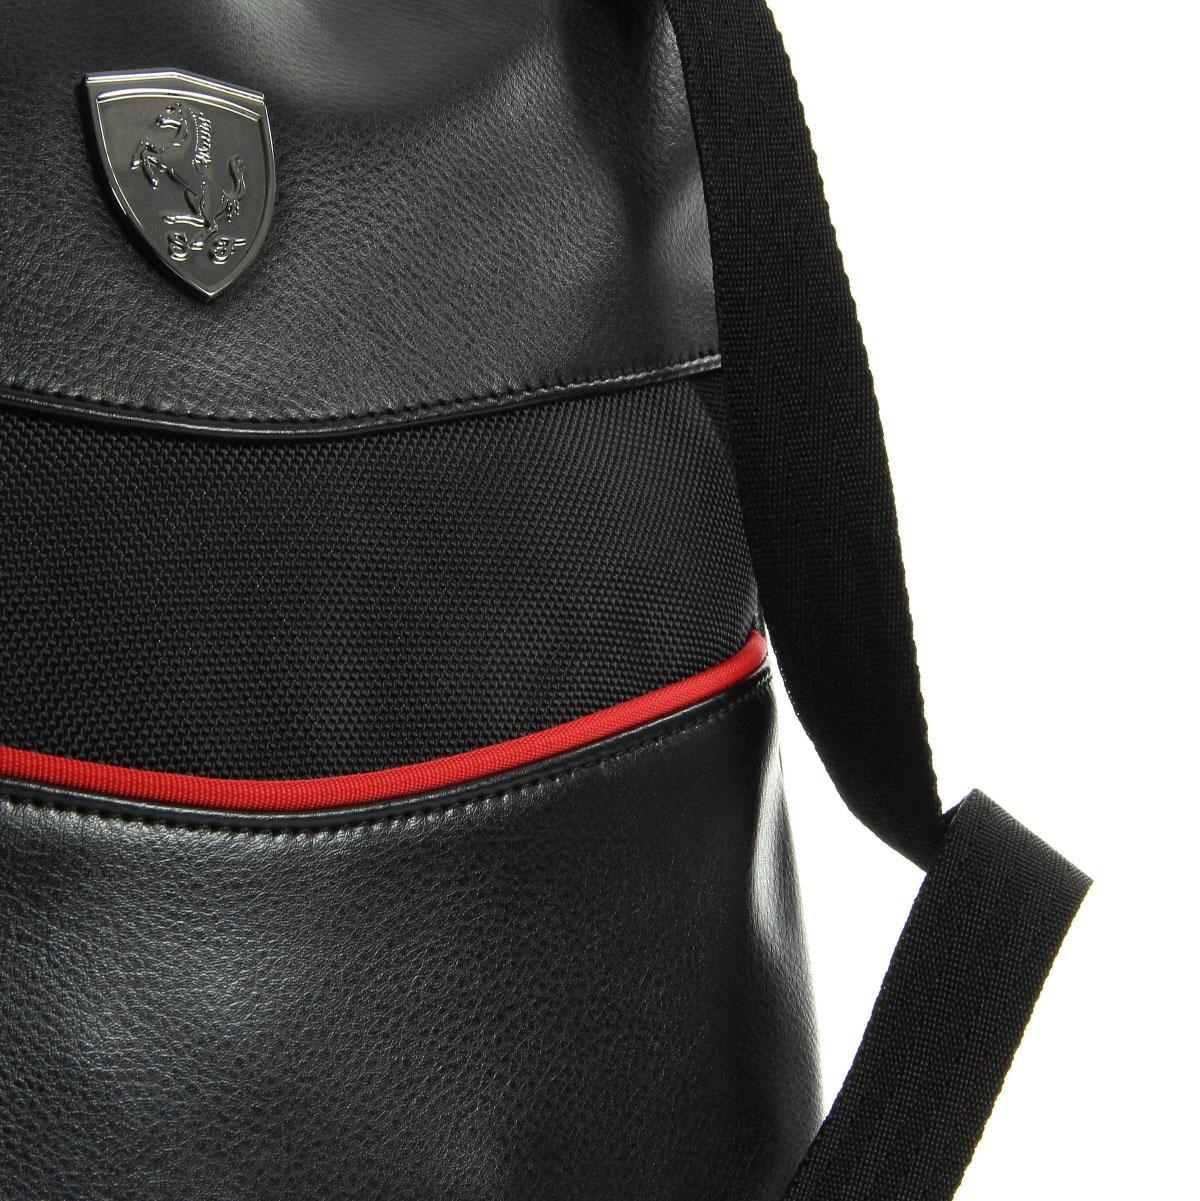 puma ferrari ls tablet bag black 07393801 sacs bandouli re sacoches unisexe. Black Bedroom Furniture Sets. Home Design Ideas